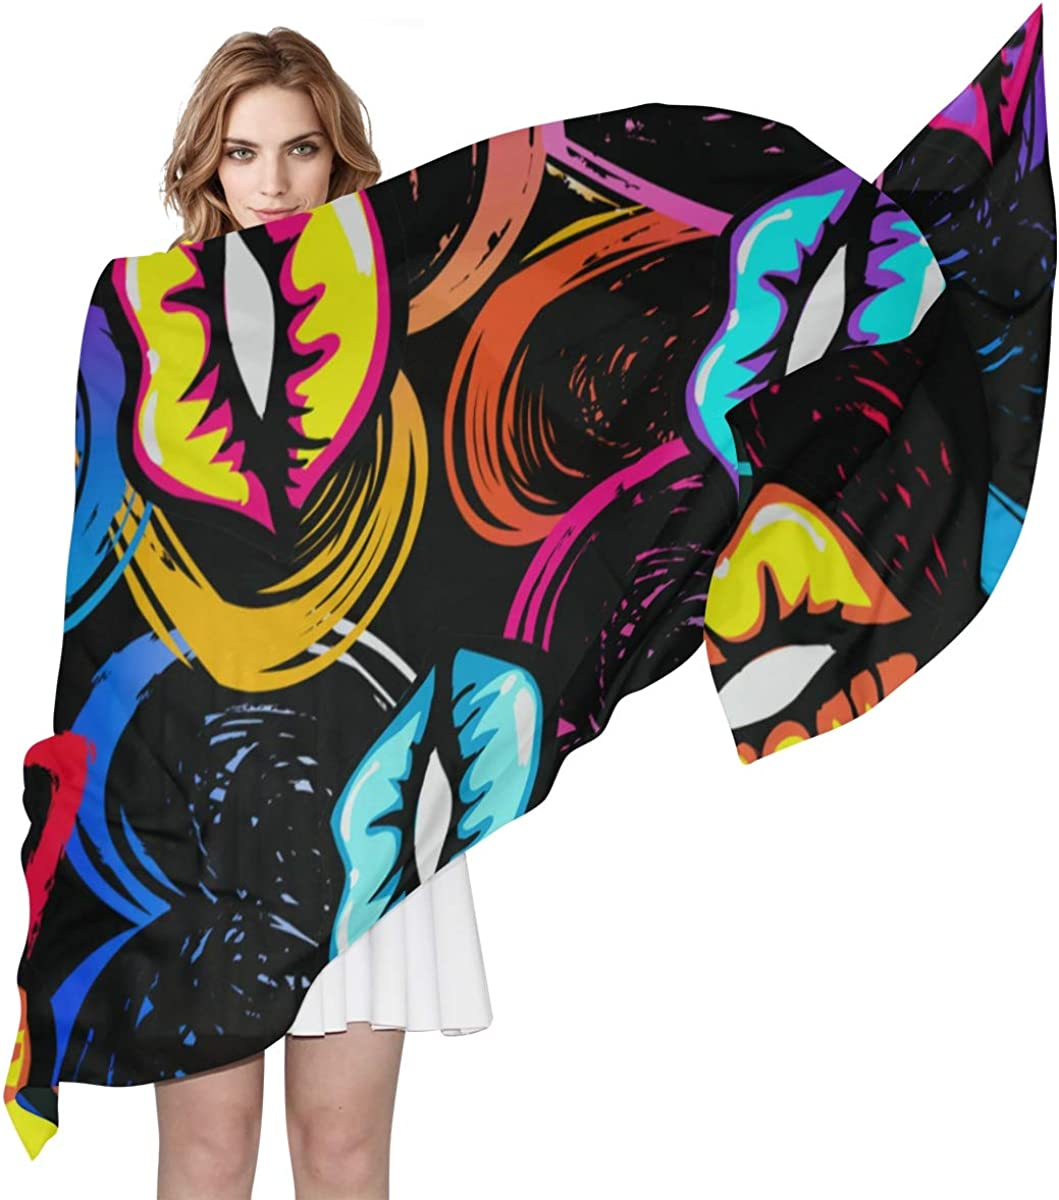 Womens Shawls And Wraps Art Block Fashion Graphic Graffiti Gifts For Women Scarf Men Fashion Head Scarfs Lightweight Print Scarves Scarf Shawl Lightweight Scarfs For Women